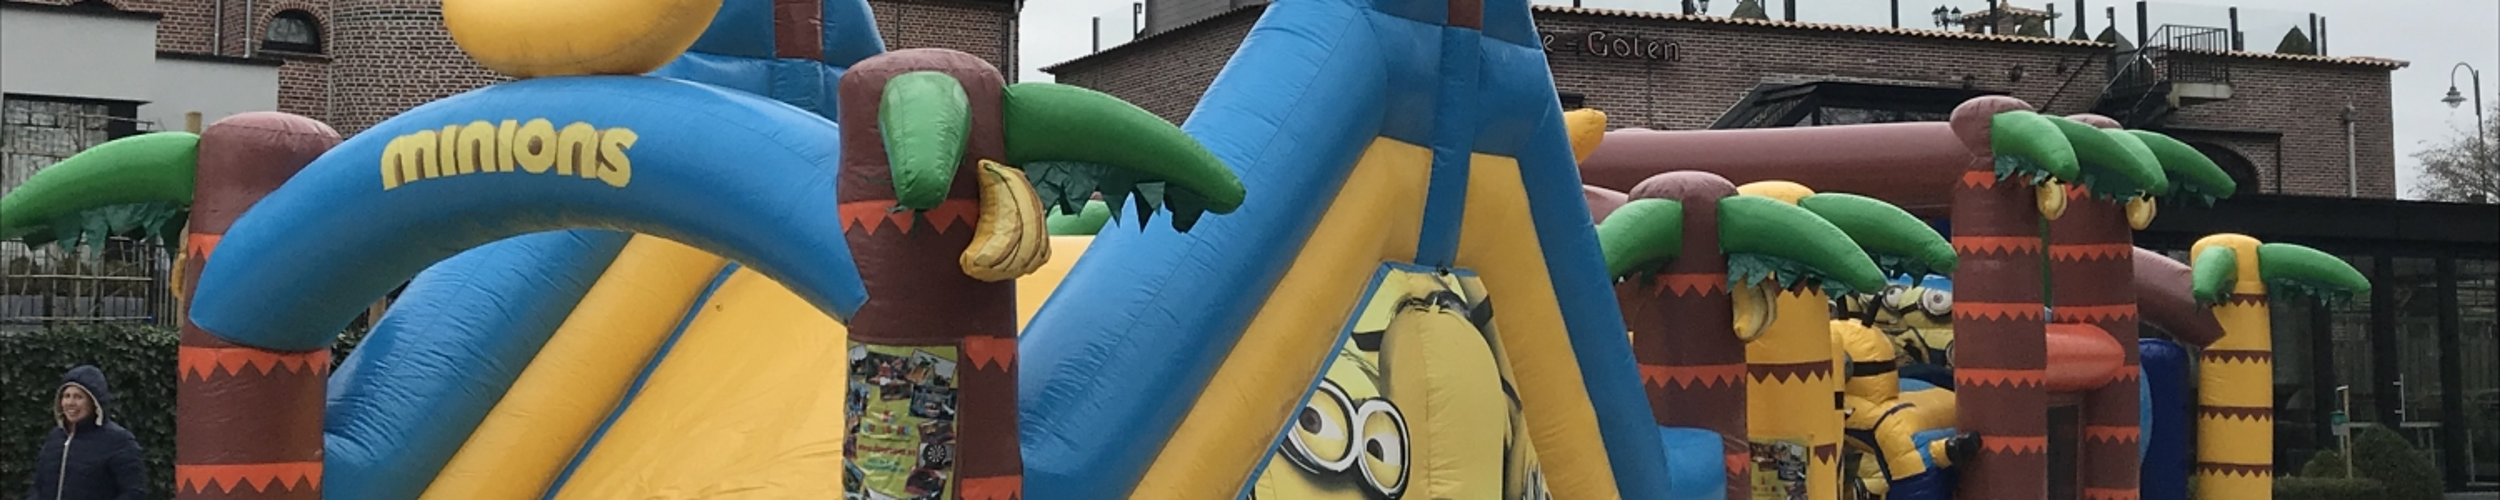 Minions run : speelplezier van 17 meter voor klein en minder klein